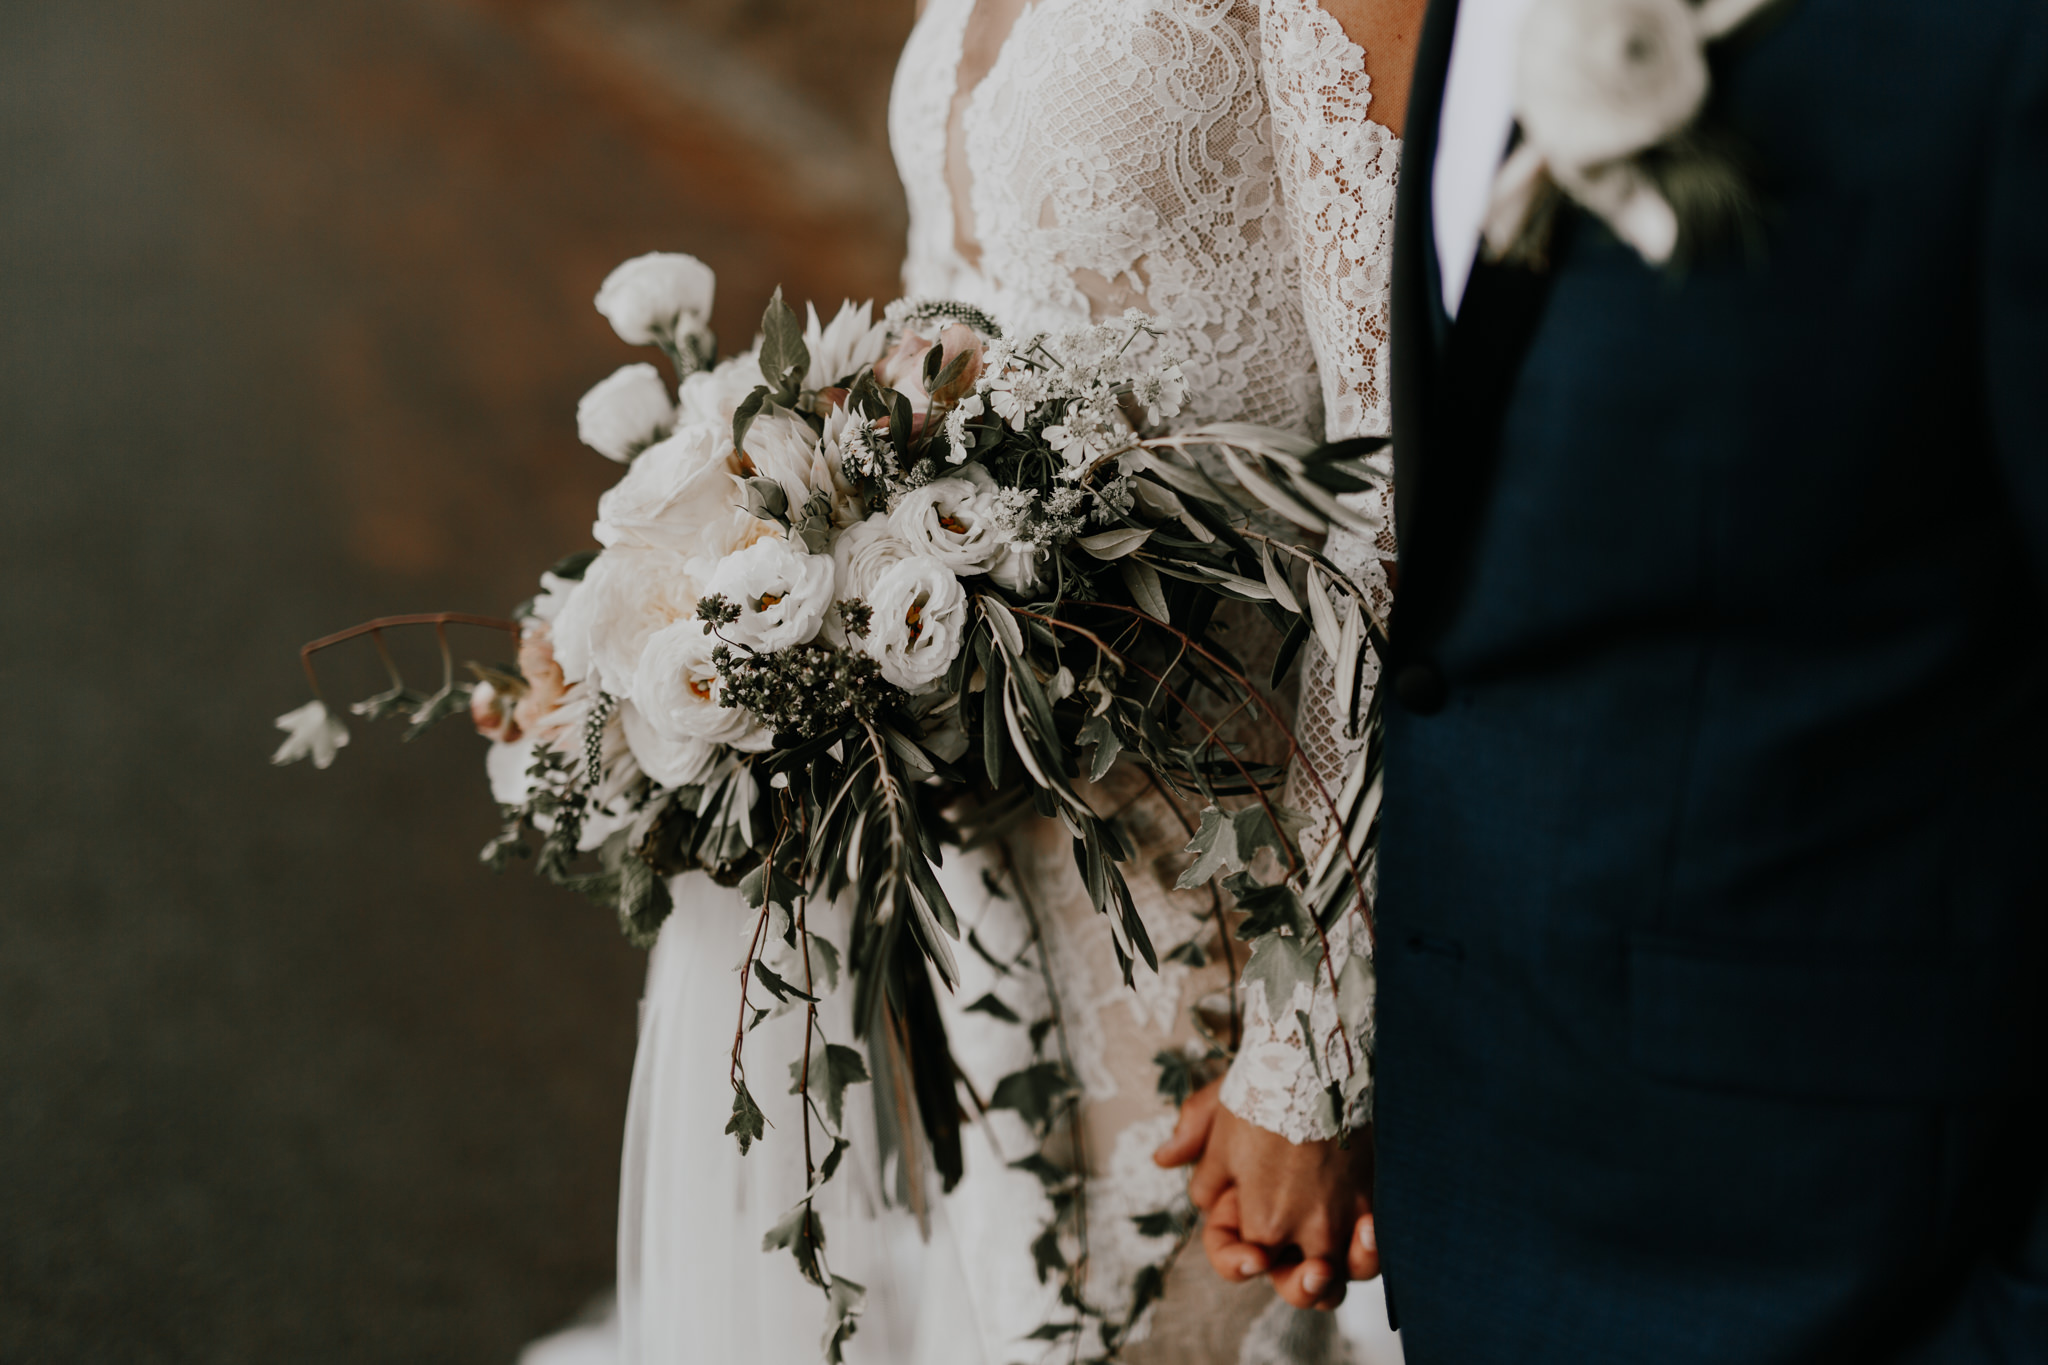 wedding-headlands-center-for-the-arts-sausalito-99.jpg